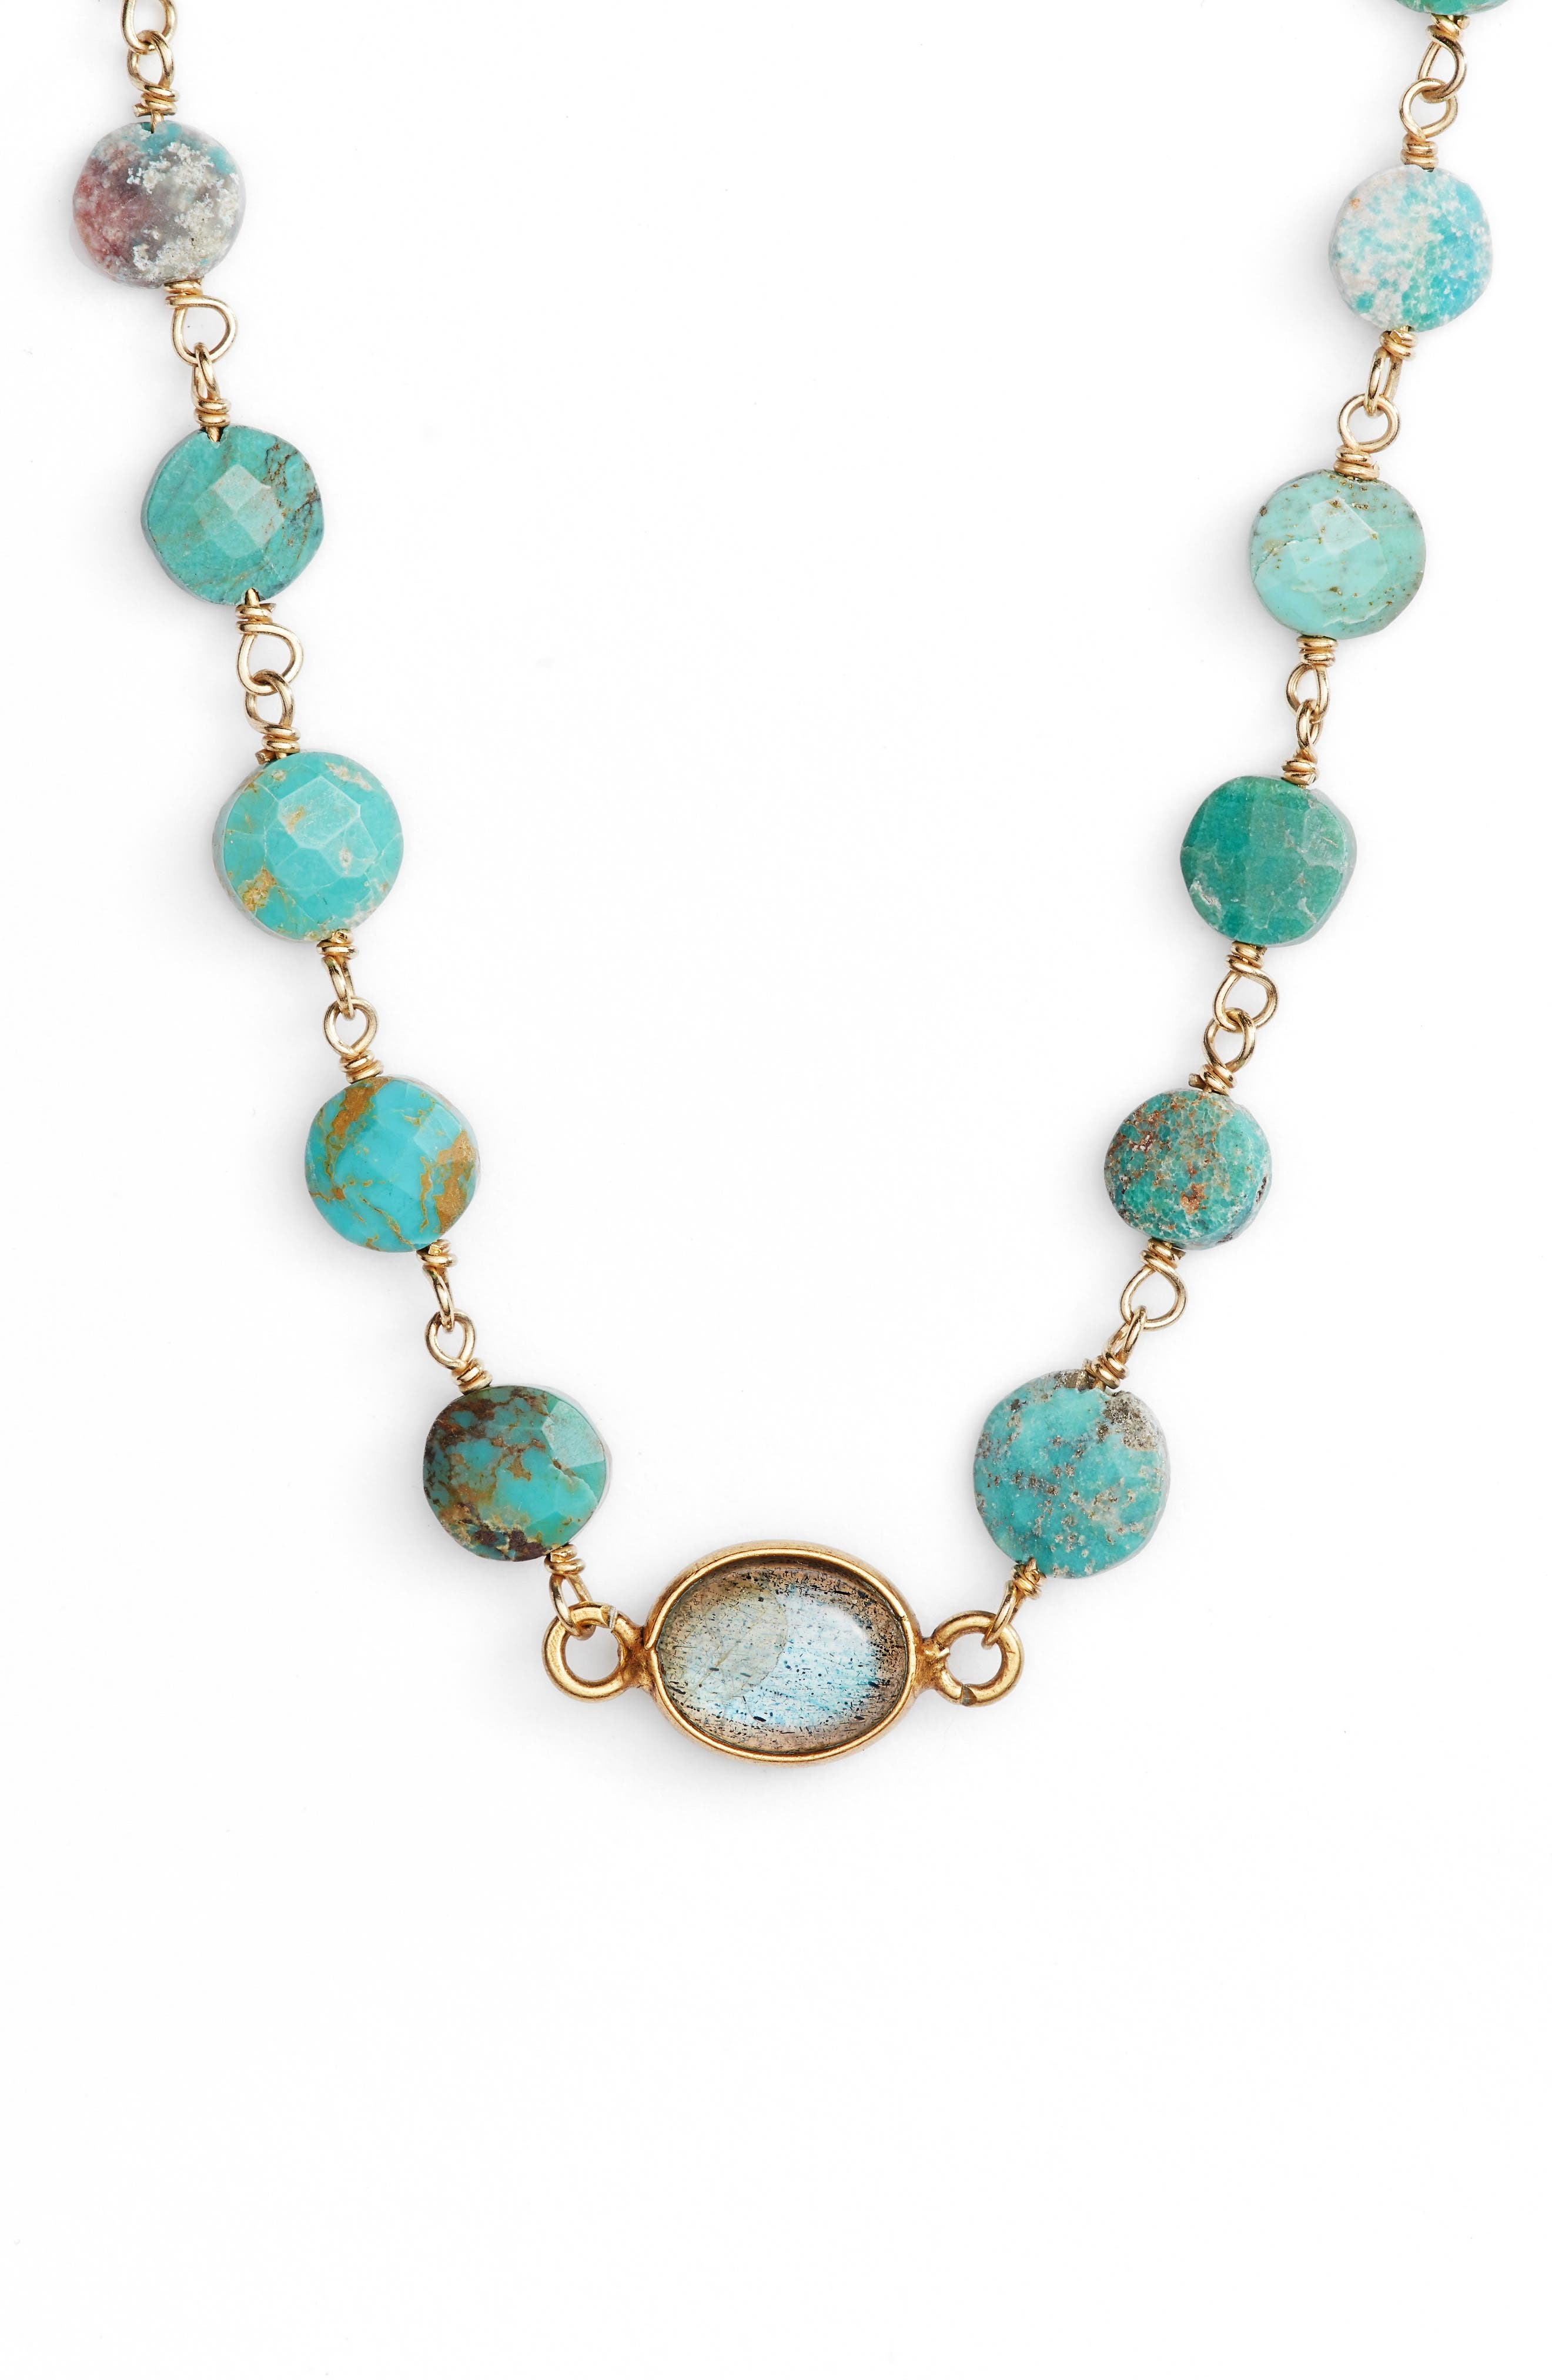 Libi Coin Pendant Necklace,                         Main,                         color, Turquoise/ Labradorite